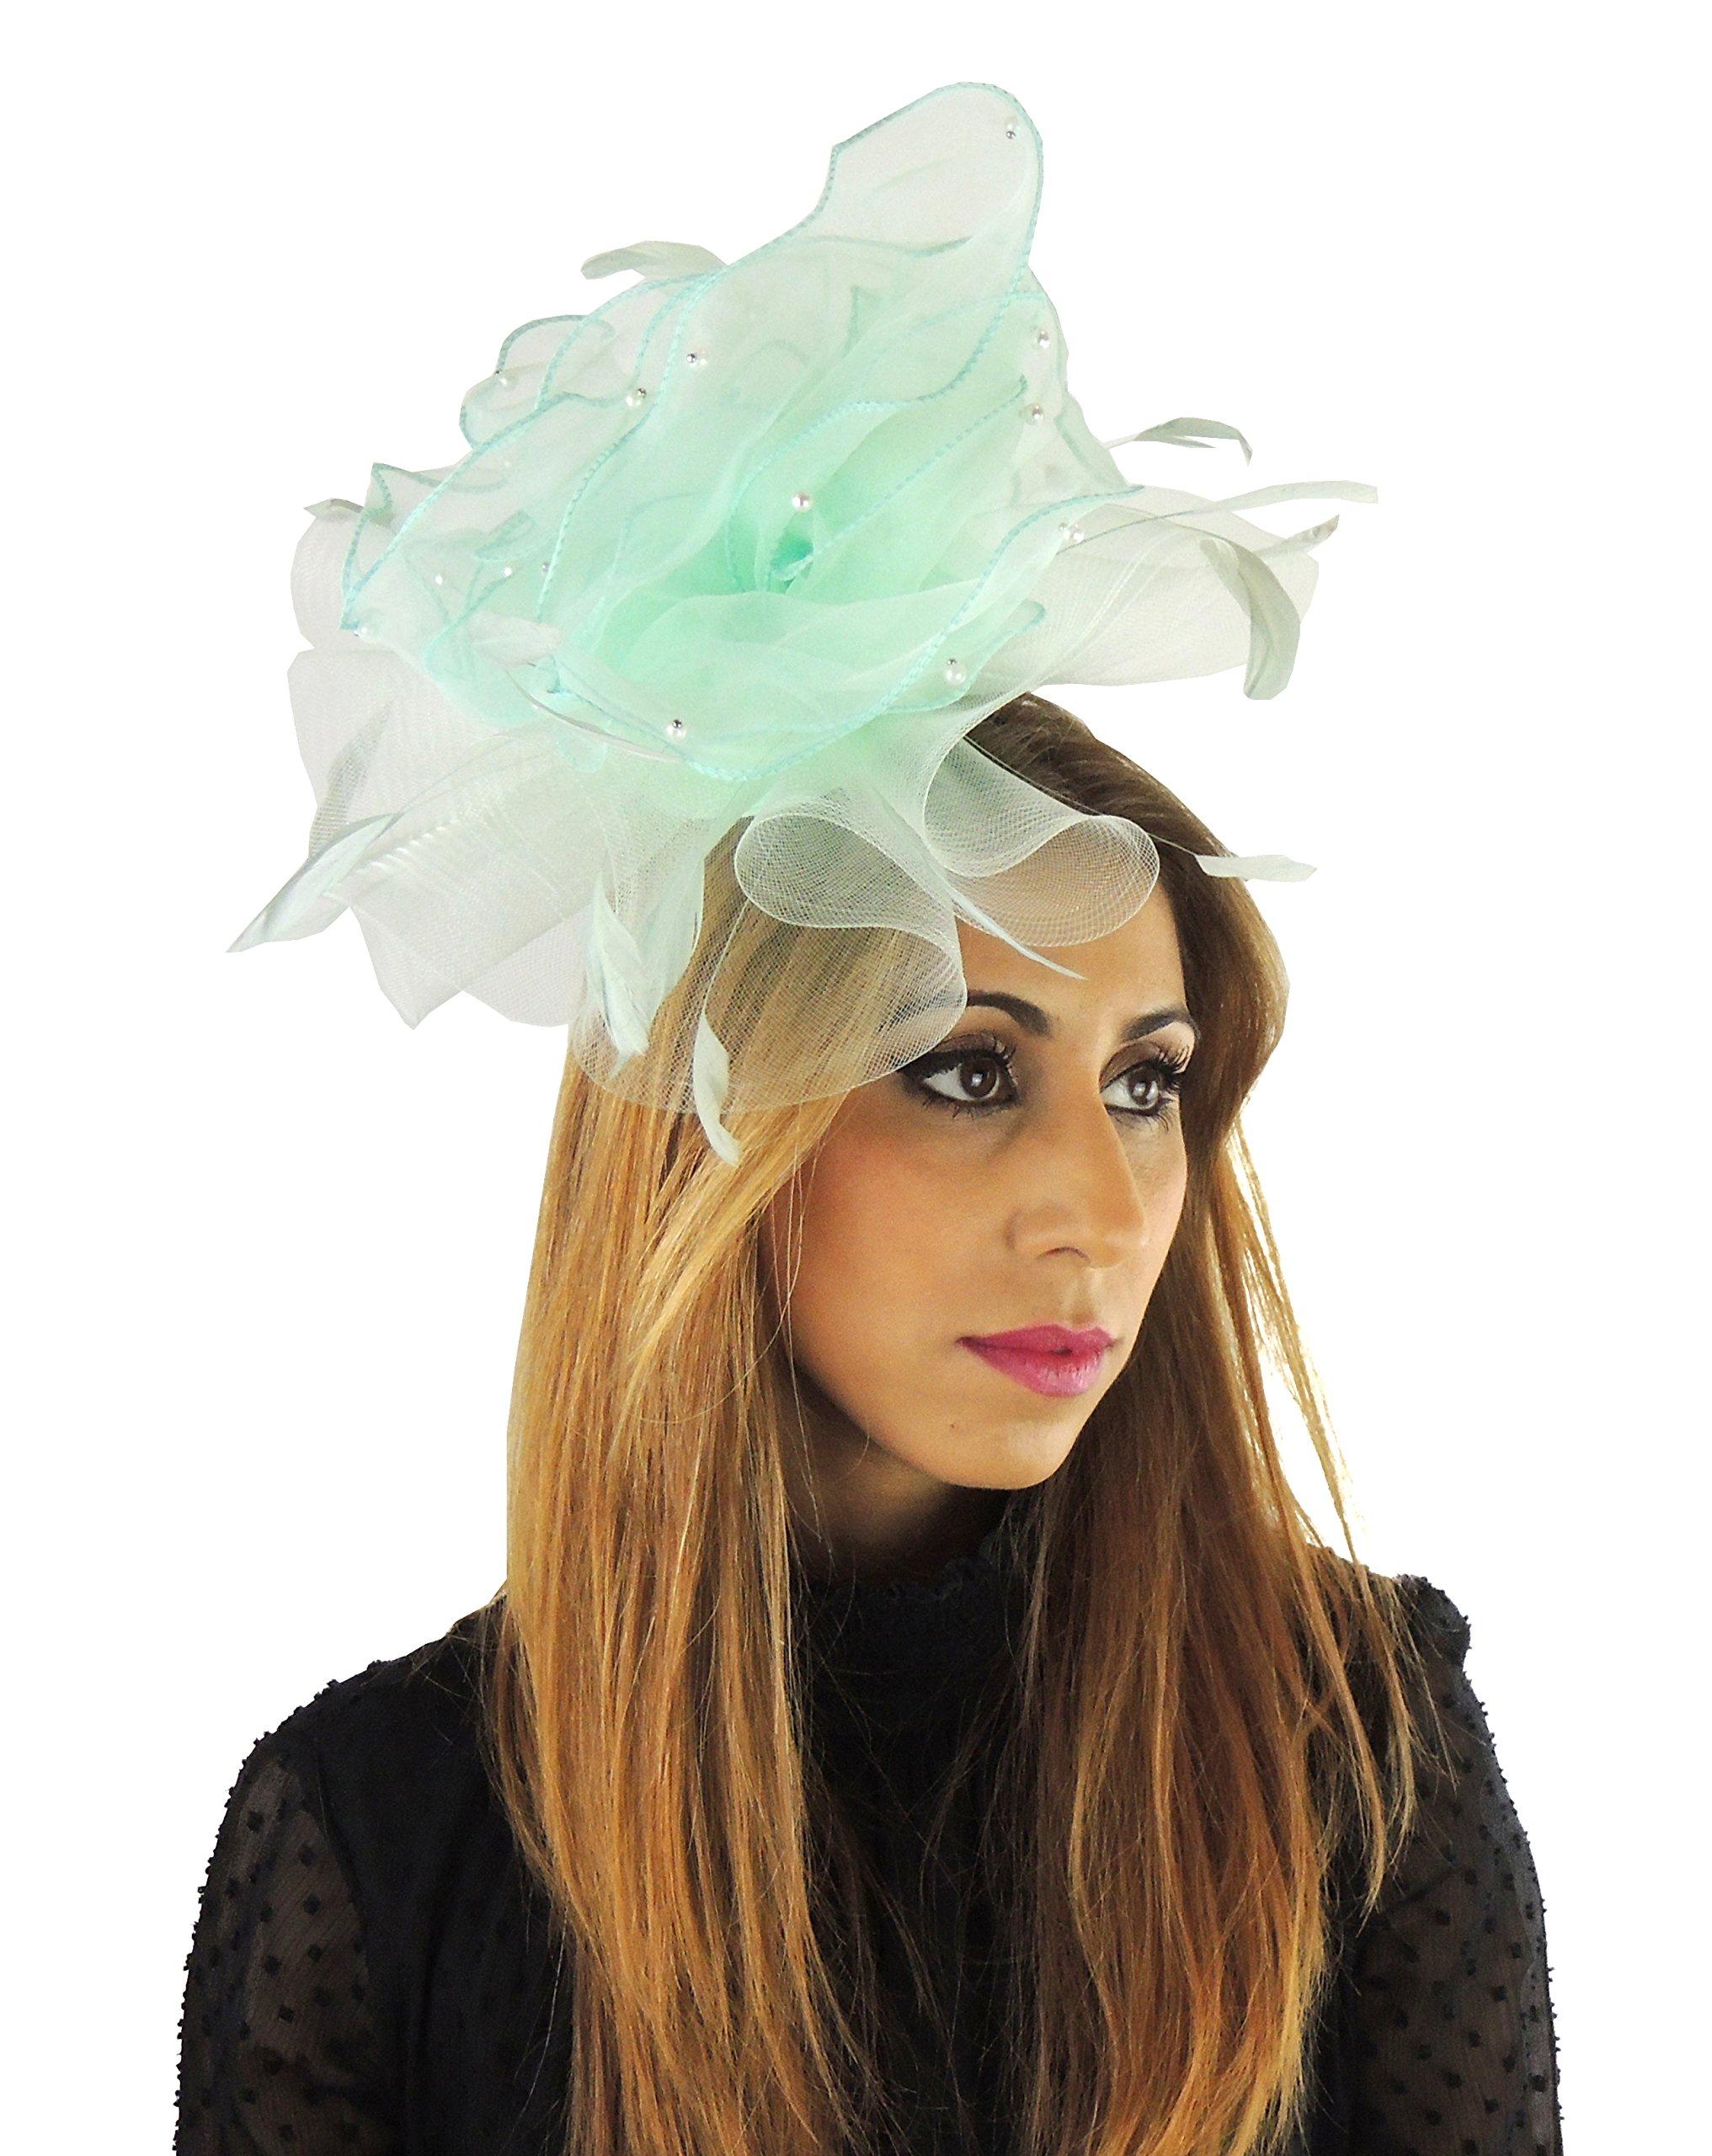 Hats By Cressida Layers Of Faux Pearl Trimmed Chiffon & crin Elegant Ladies Ascot Wedding Fascinator Hat Mint